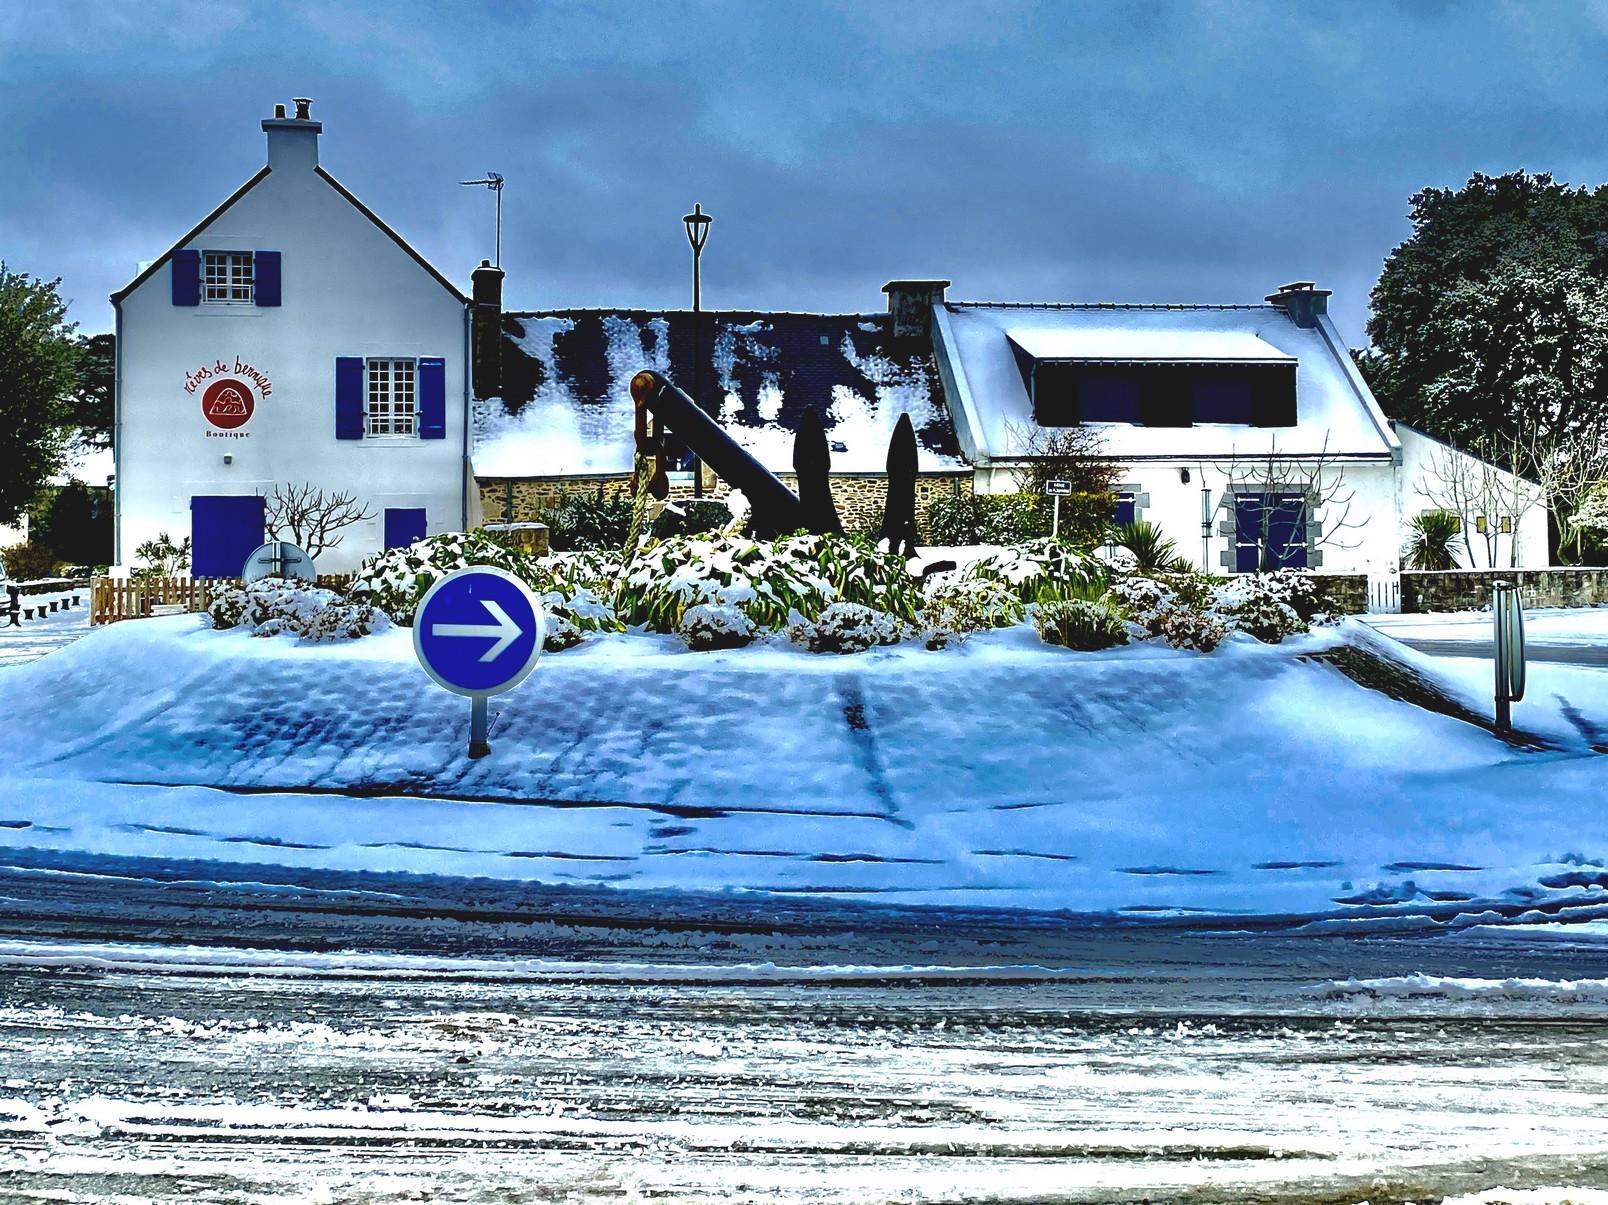 Penerf en Damgan sous la neige - morbihan bretagne©Philippe Jaquemin (11)